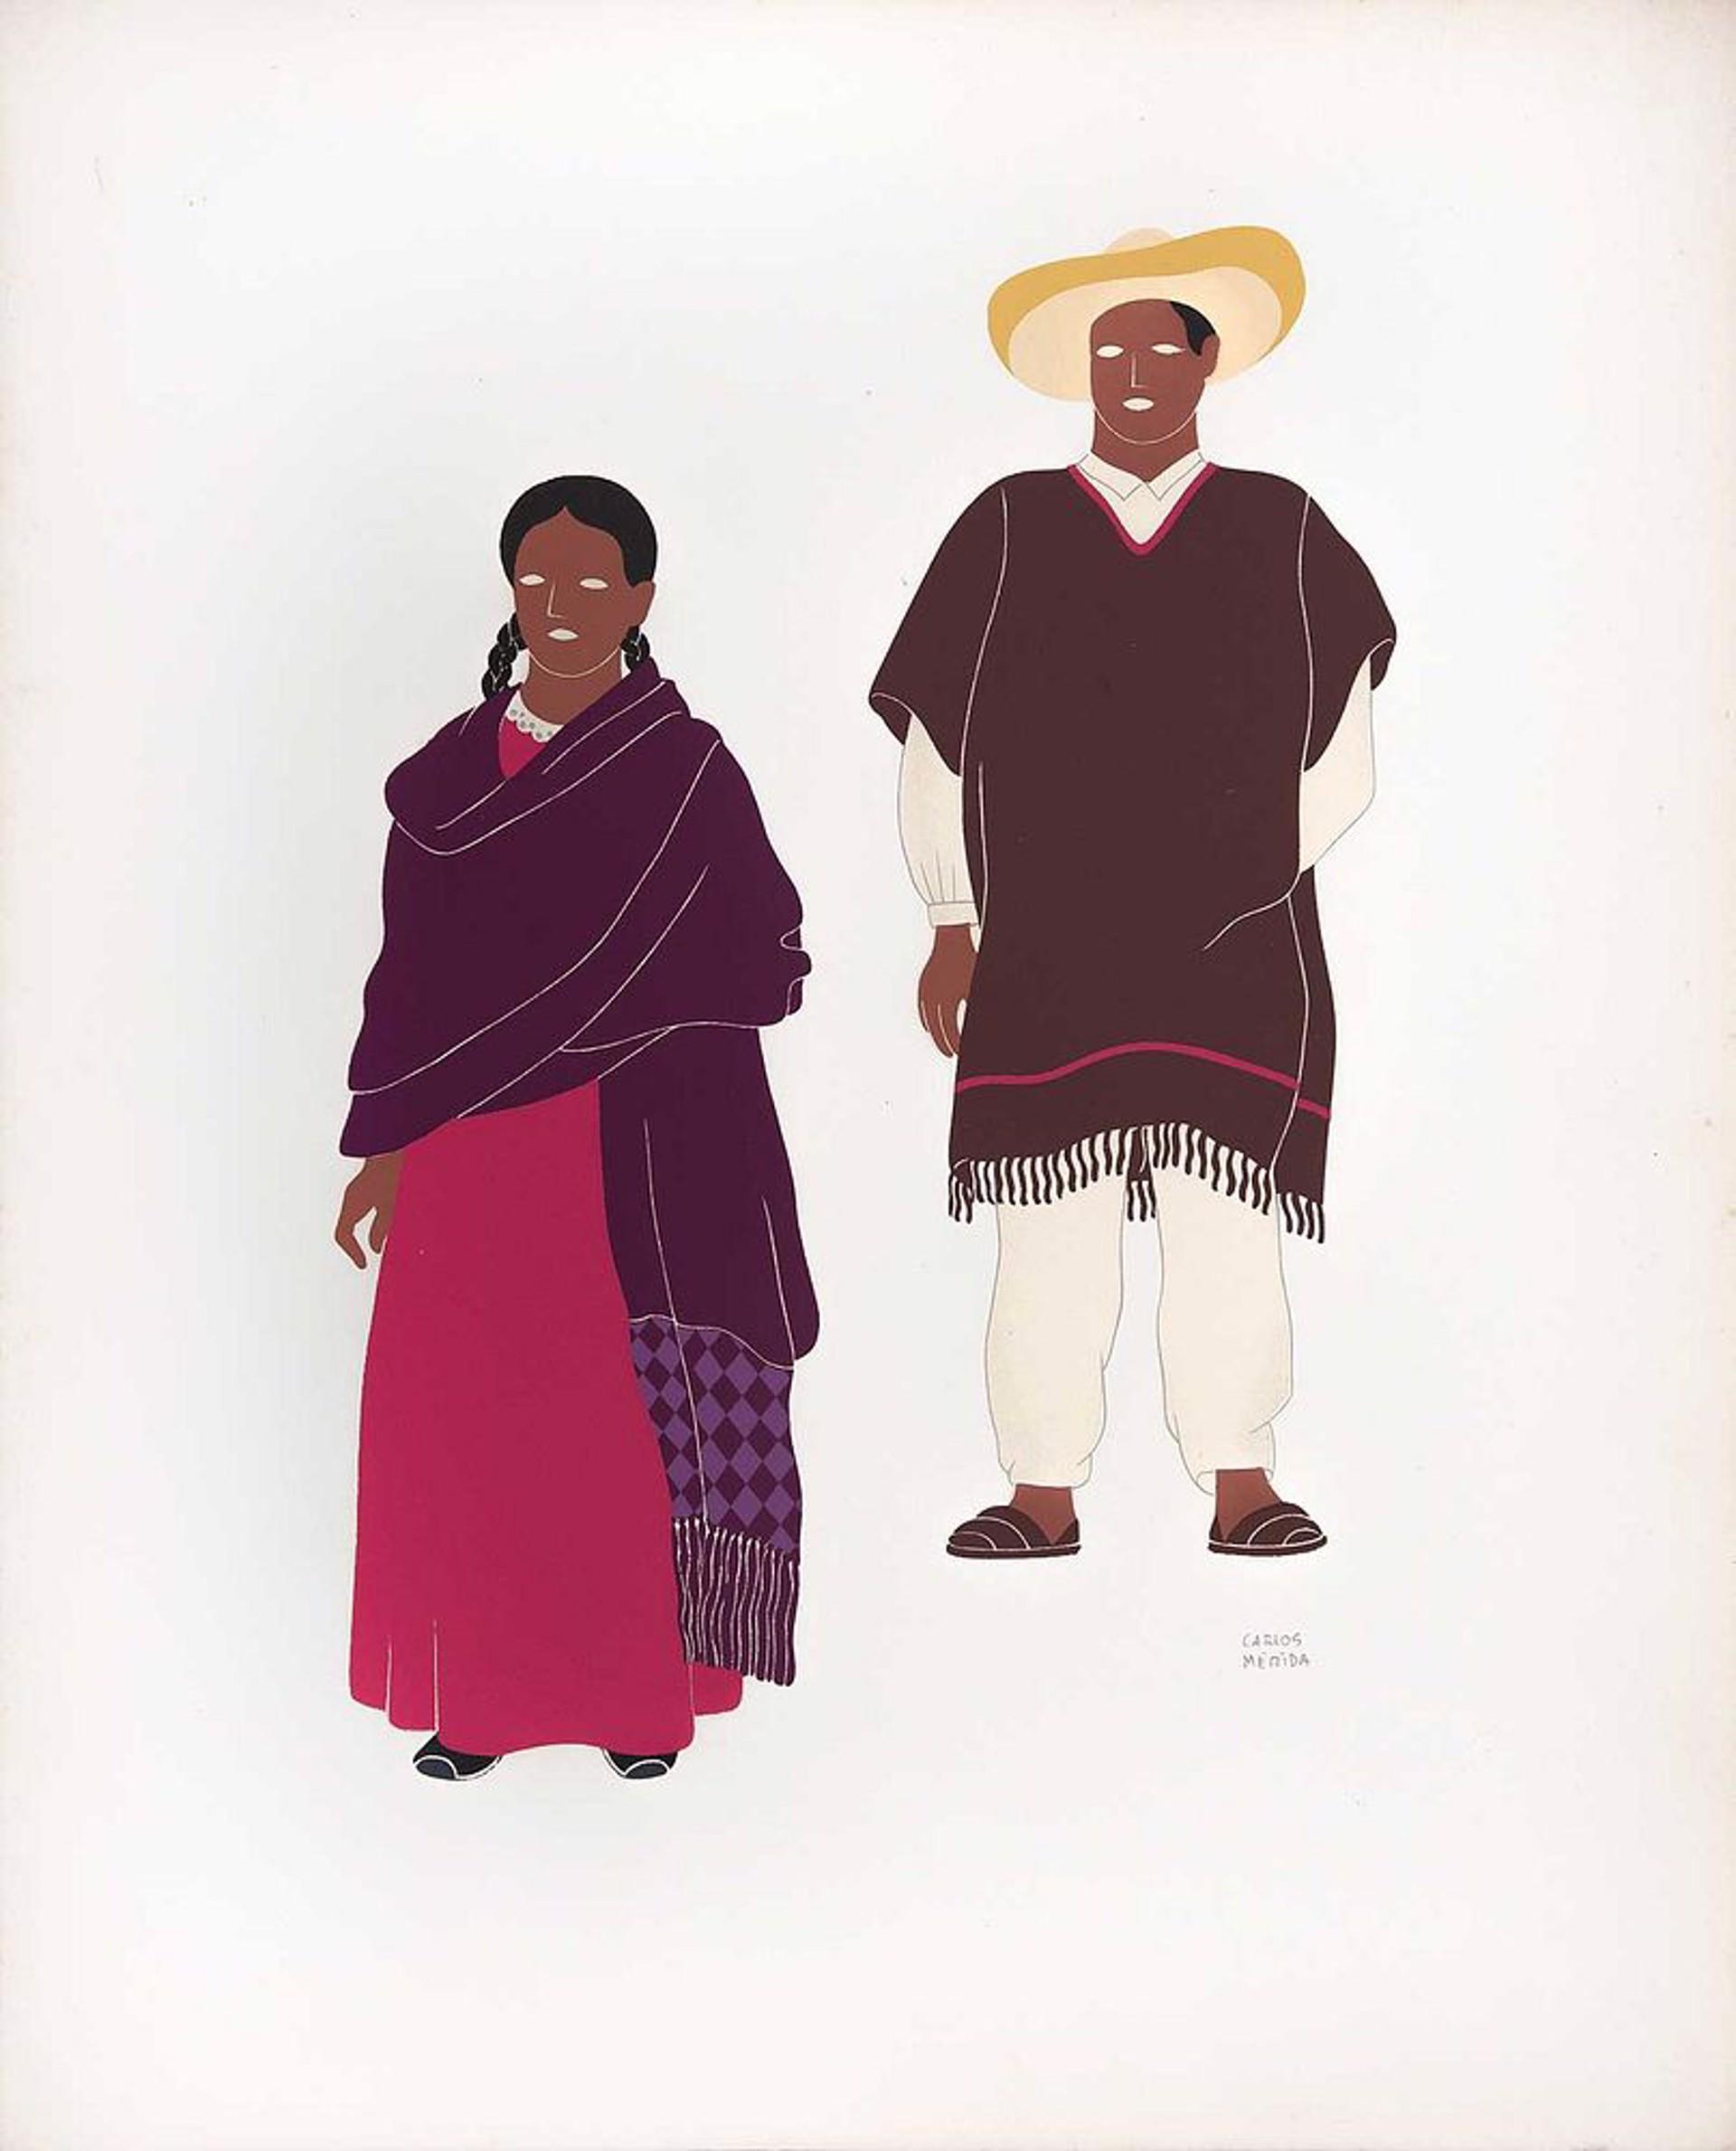 The Sarape & the Rebozo by Carlos Mérida (1891 - 1985)